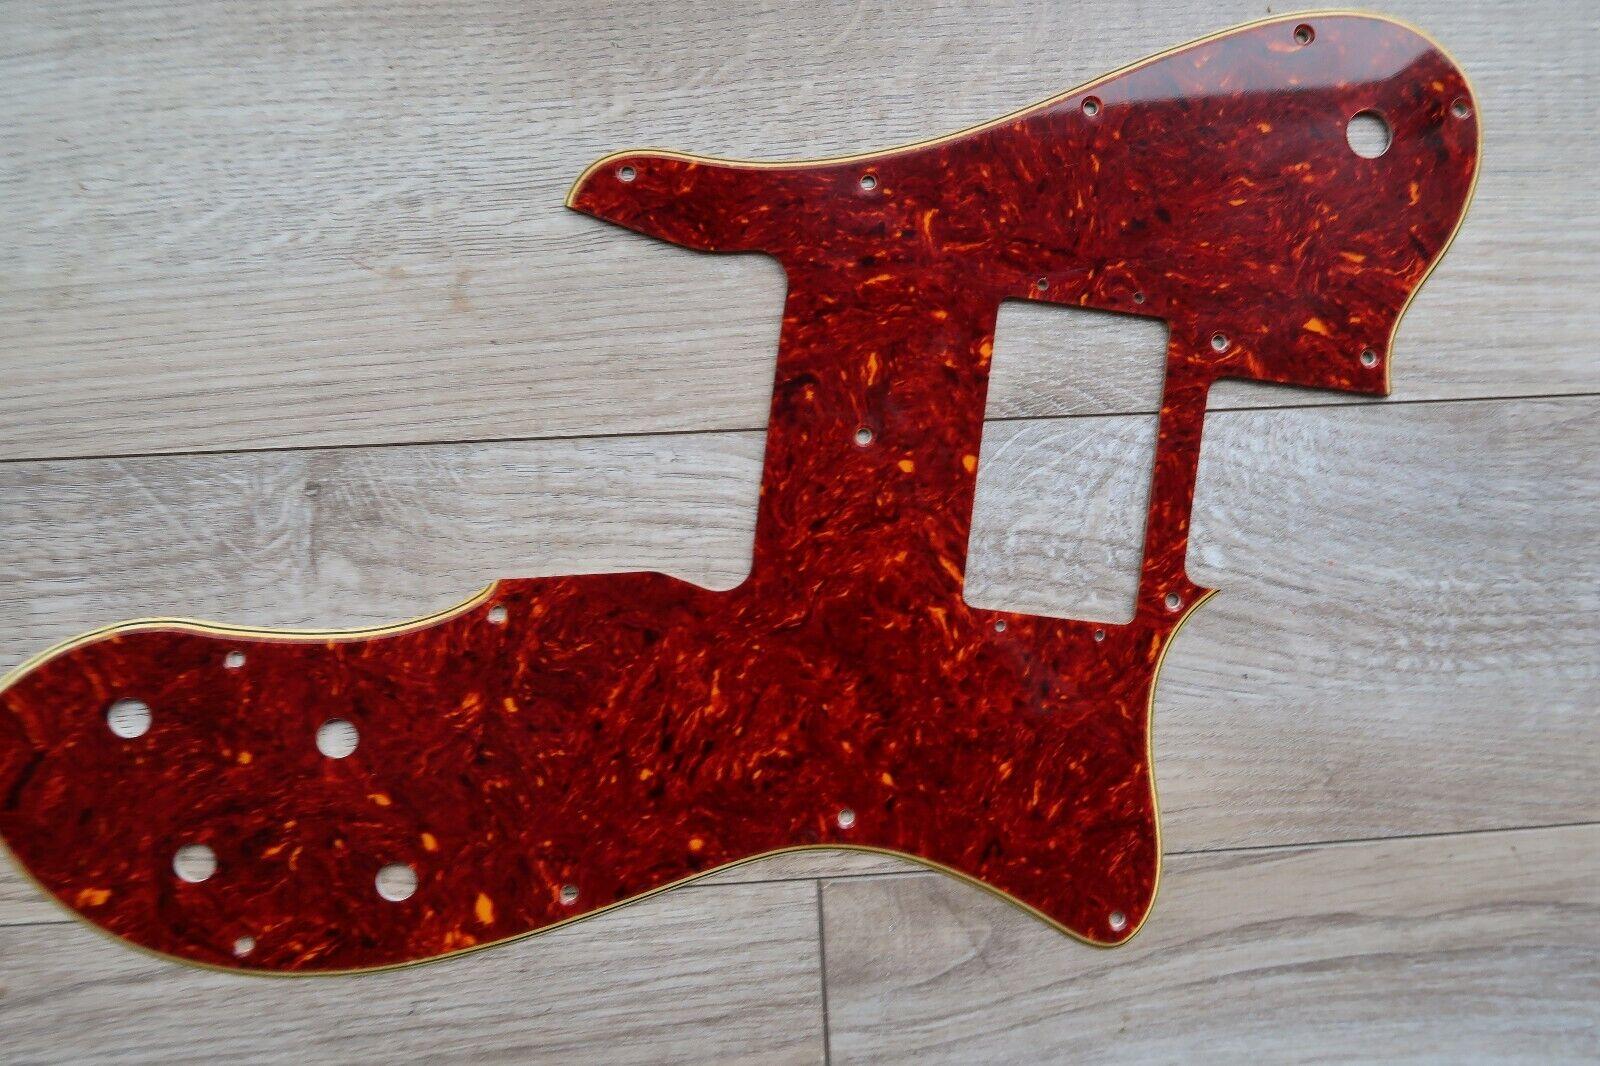 '71 79 Fender Telecaster Thinline  Nitrate Tortoise Celluloid Pickguard Tele 60s